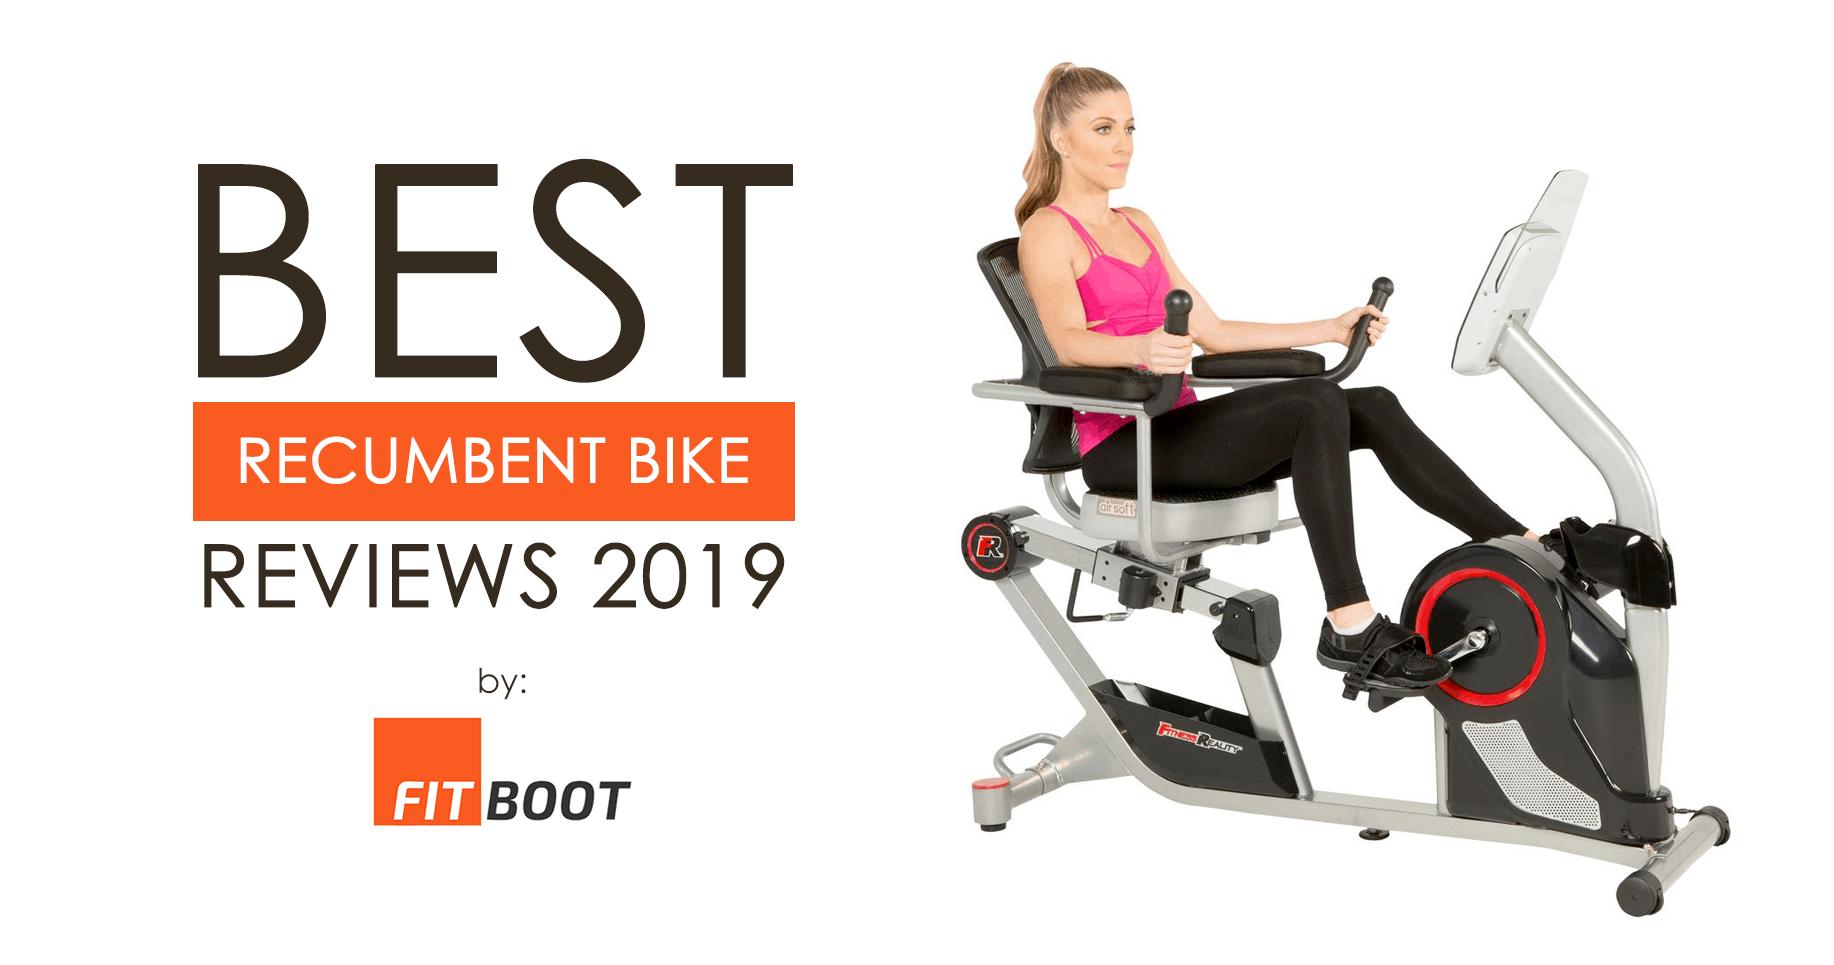 Best Recumbent Bike Reviews (2019)